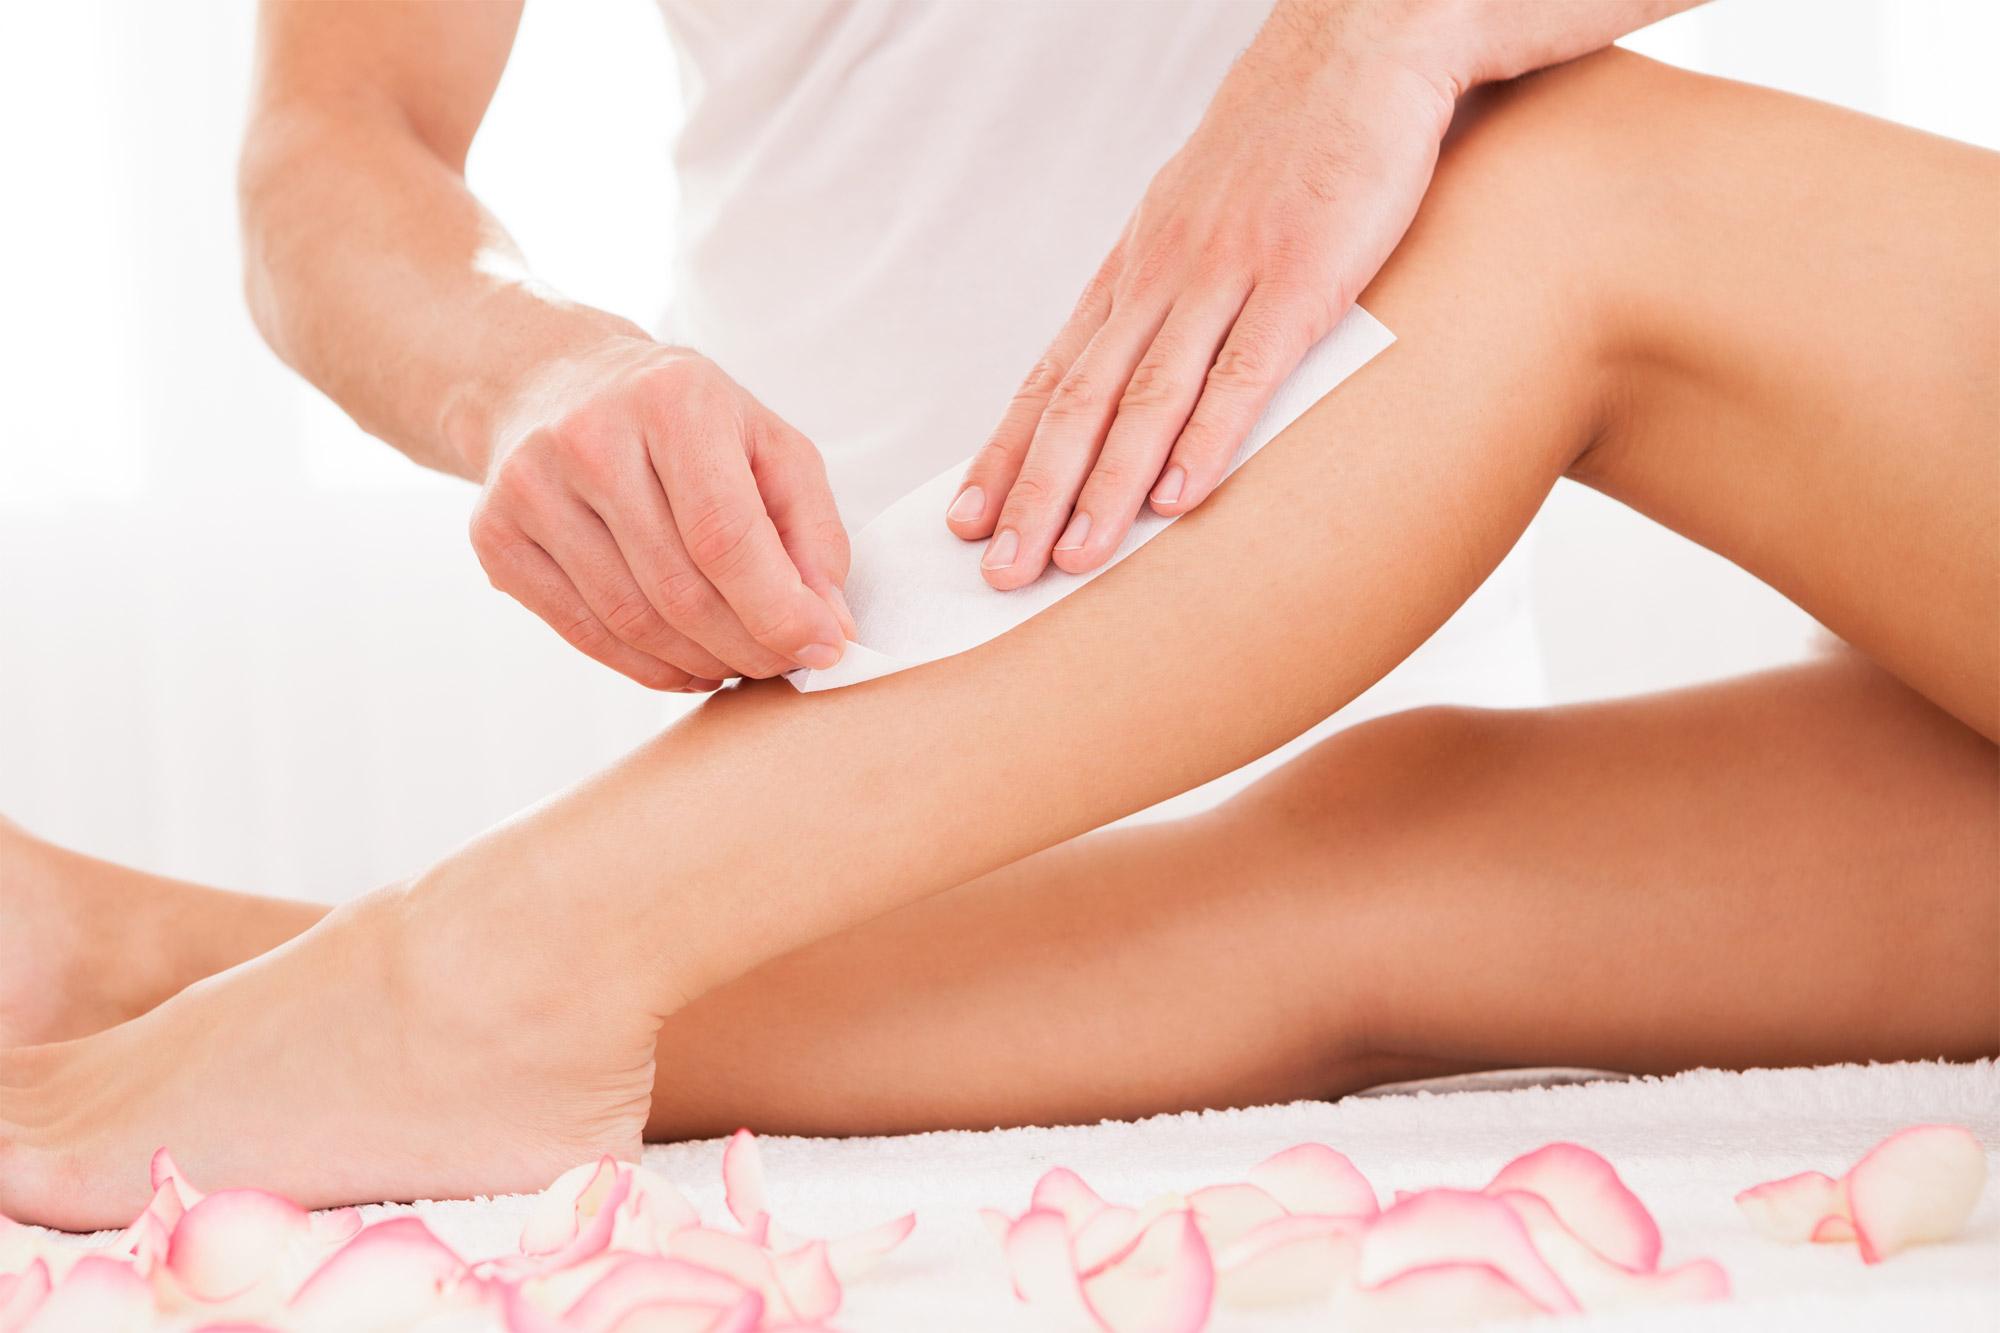 Depilación - Golden Touch Massage & Beauty Salon